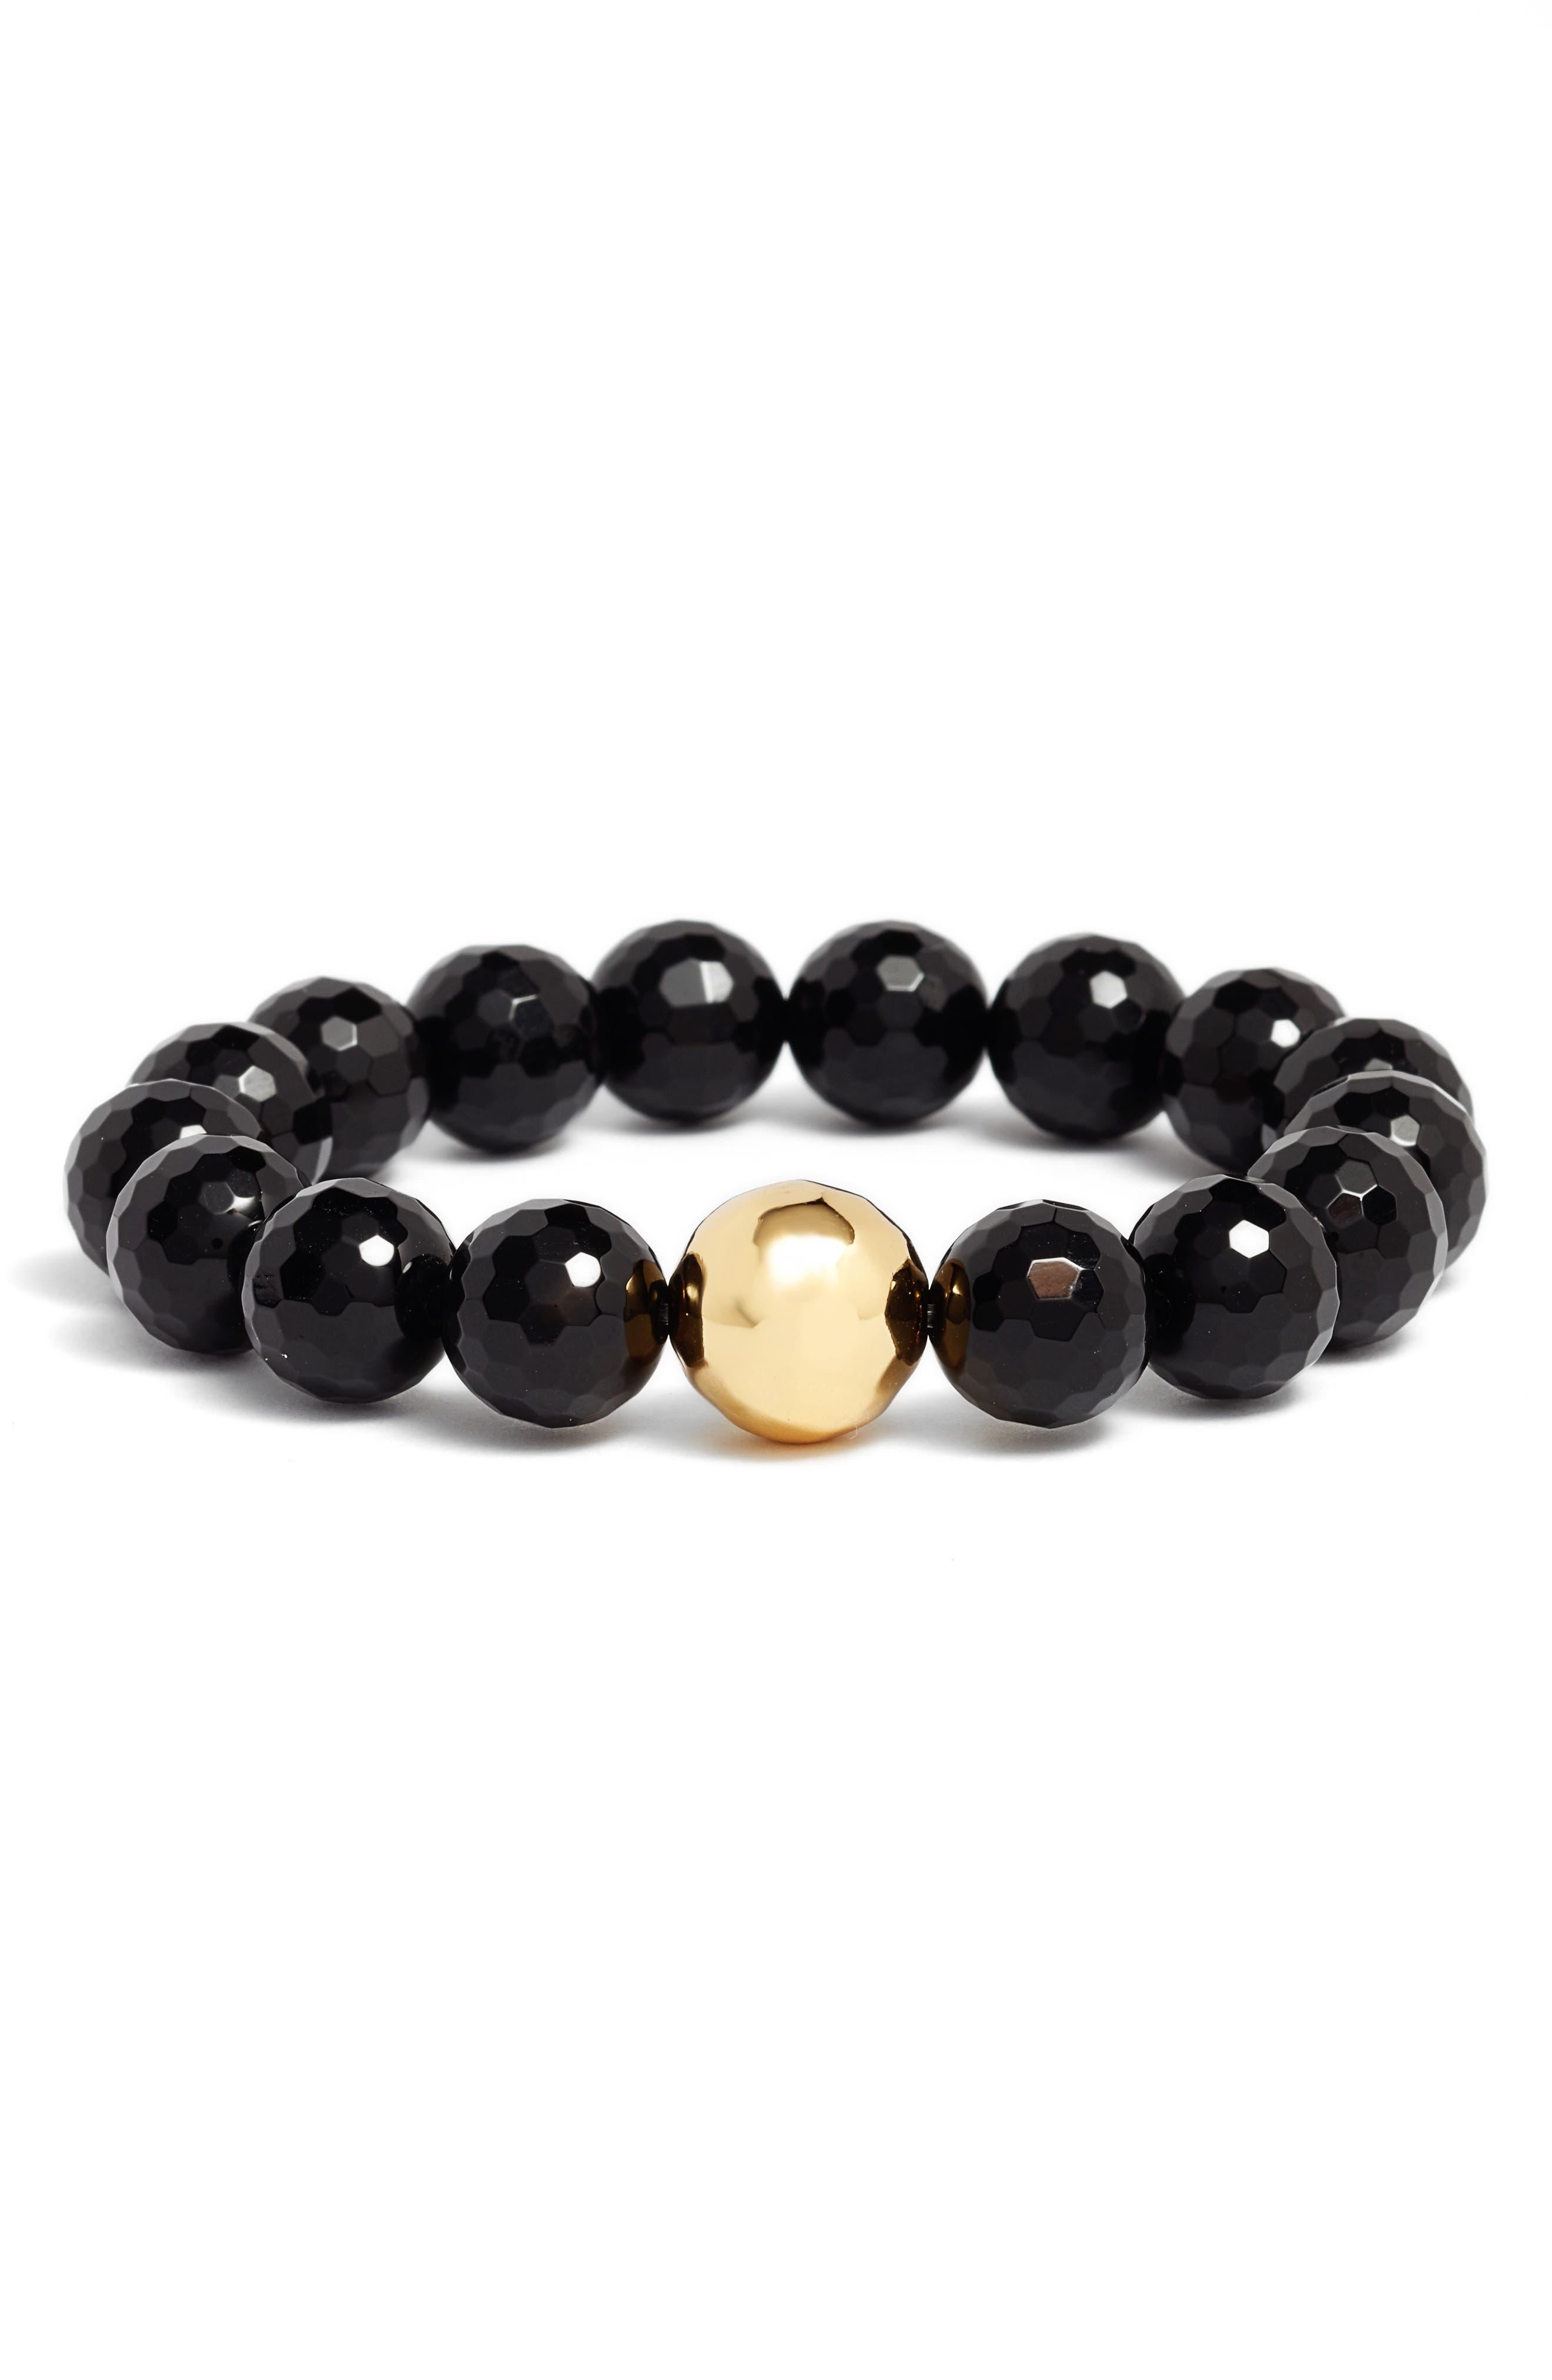 Power Gemstone Black Onyx Protection Bracelet,                             Main thumbnail 1, color,                             001